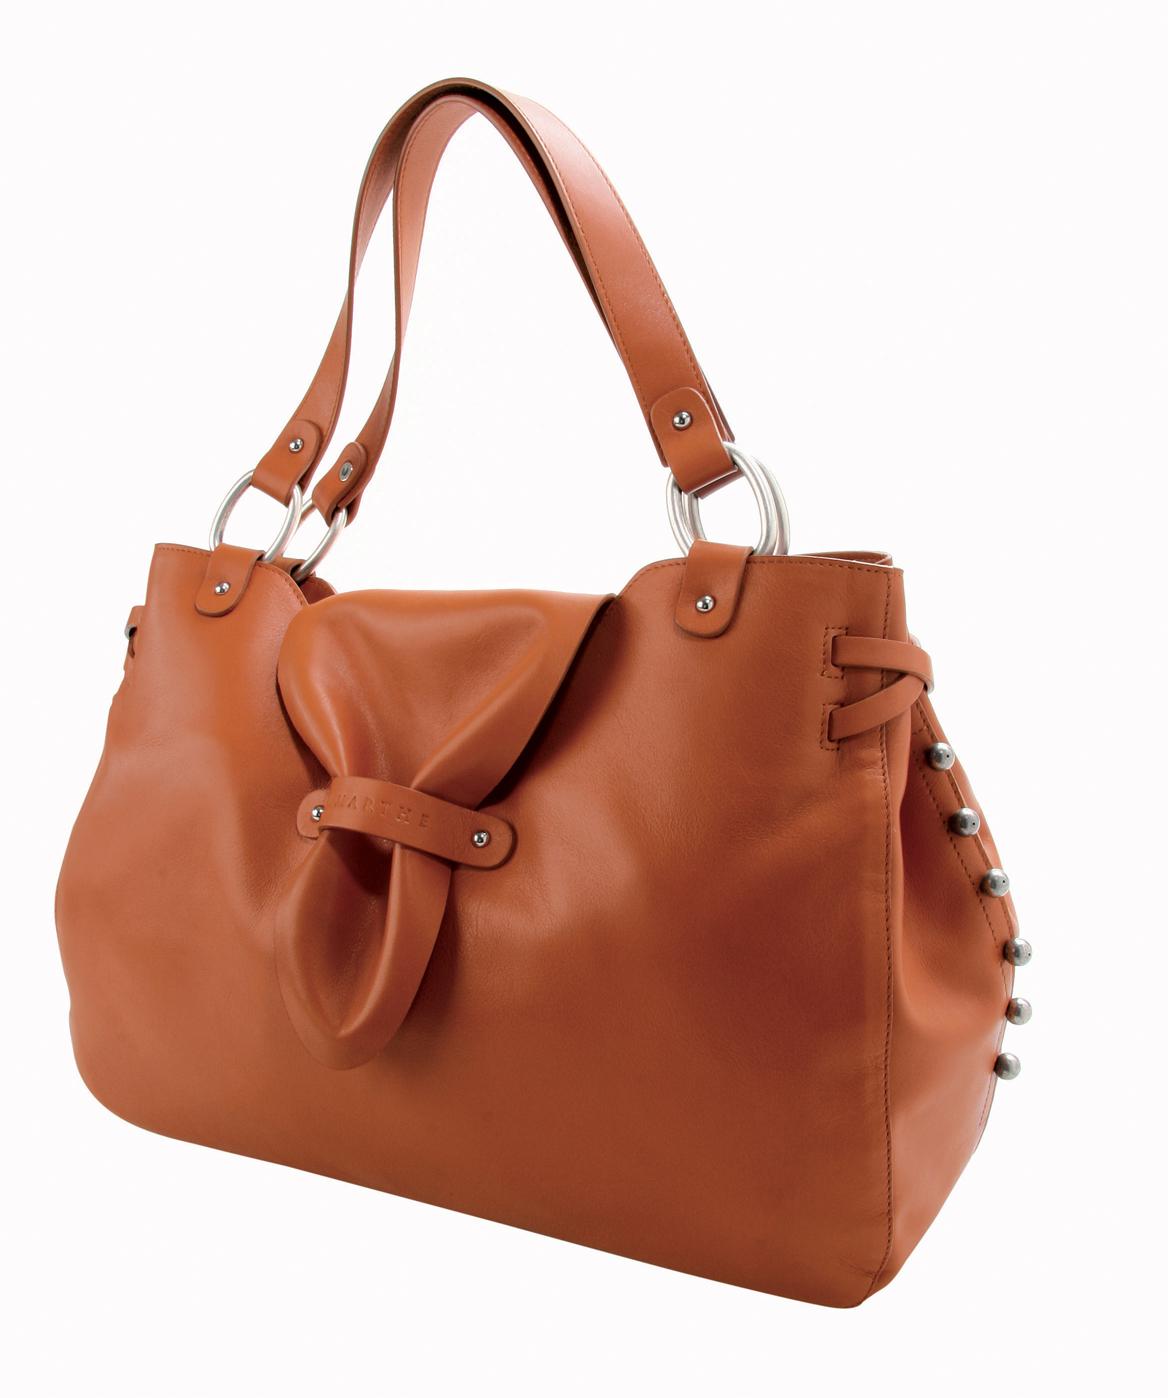 Luxury Handbag Retailer Lamarthe